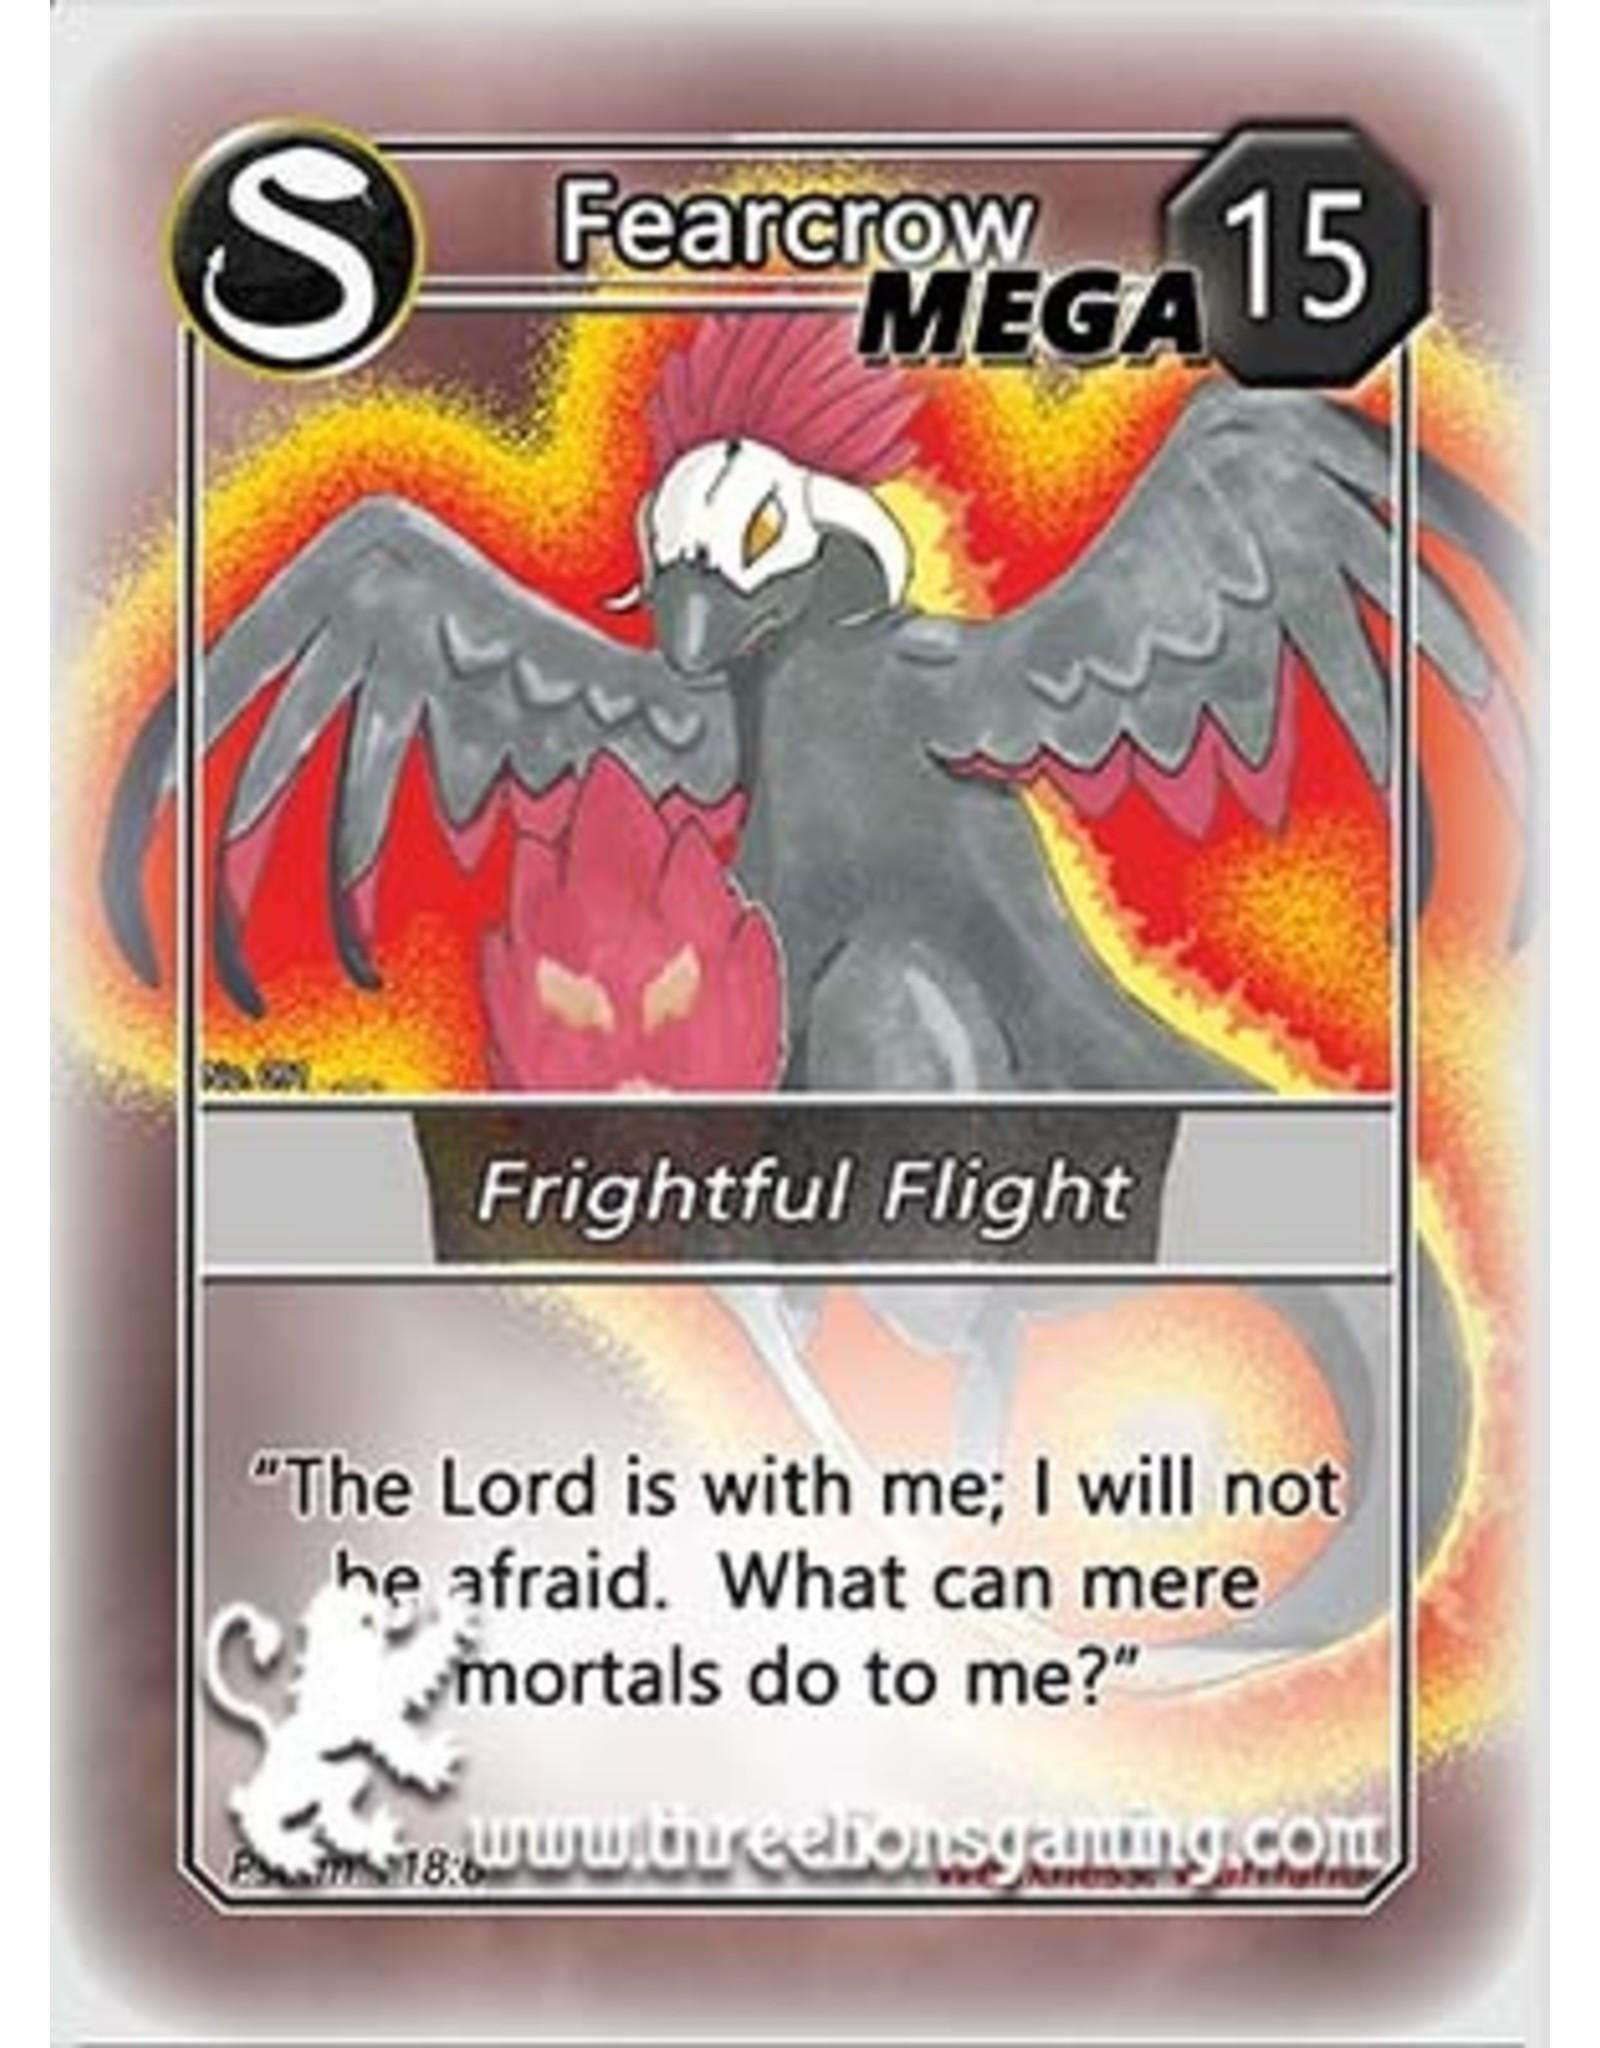 S1: Fearcrow Mega